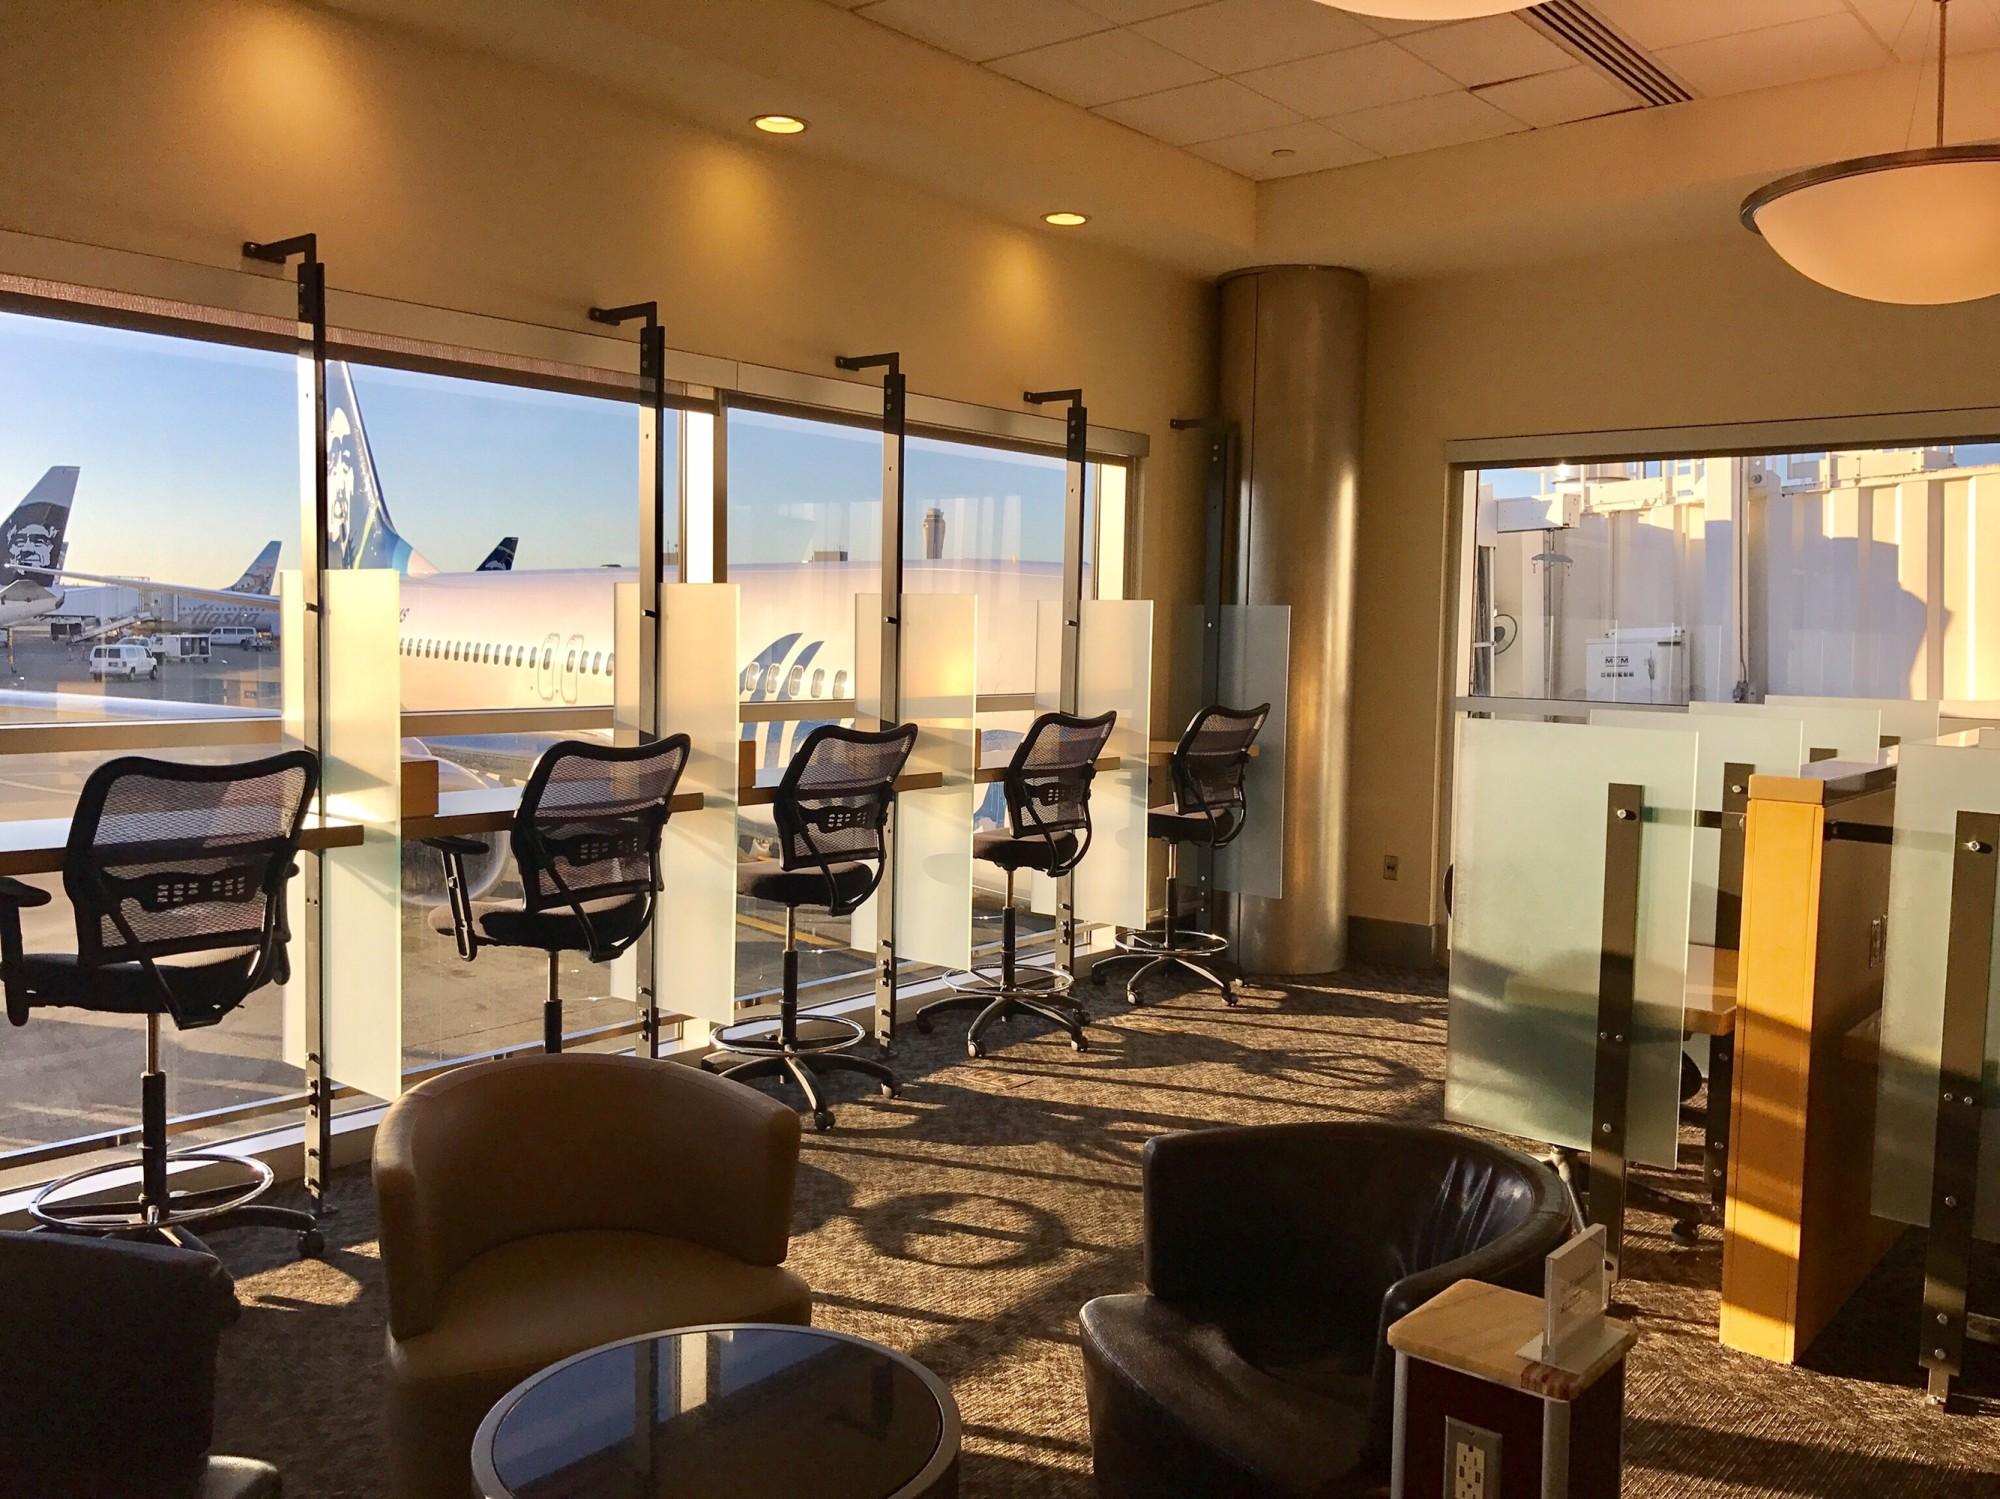 SEA: Alaska Airlines Alaska Lounge Reviews & Photos - Concourse D ...